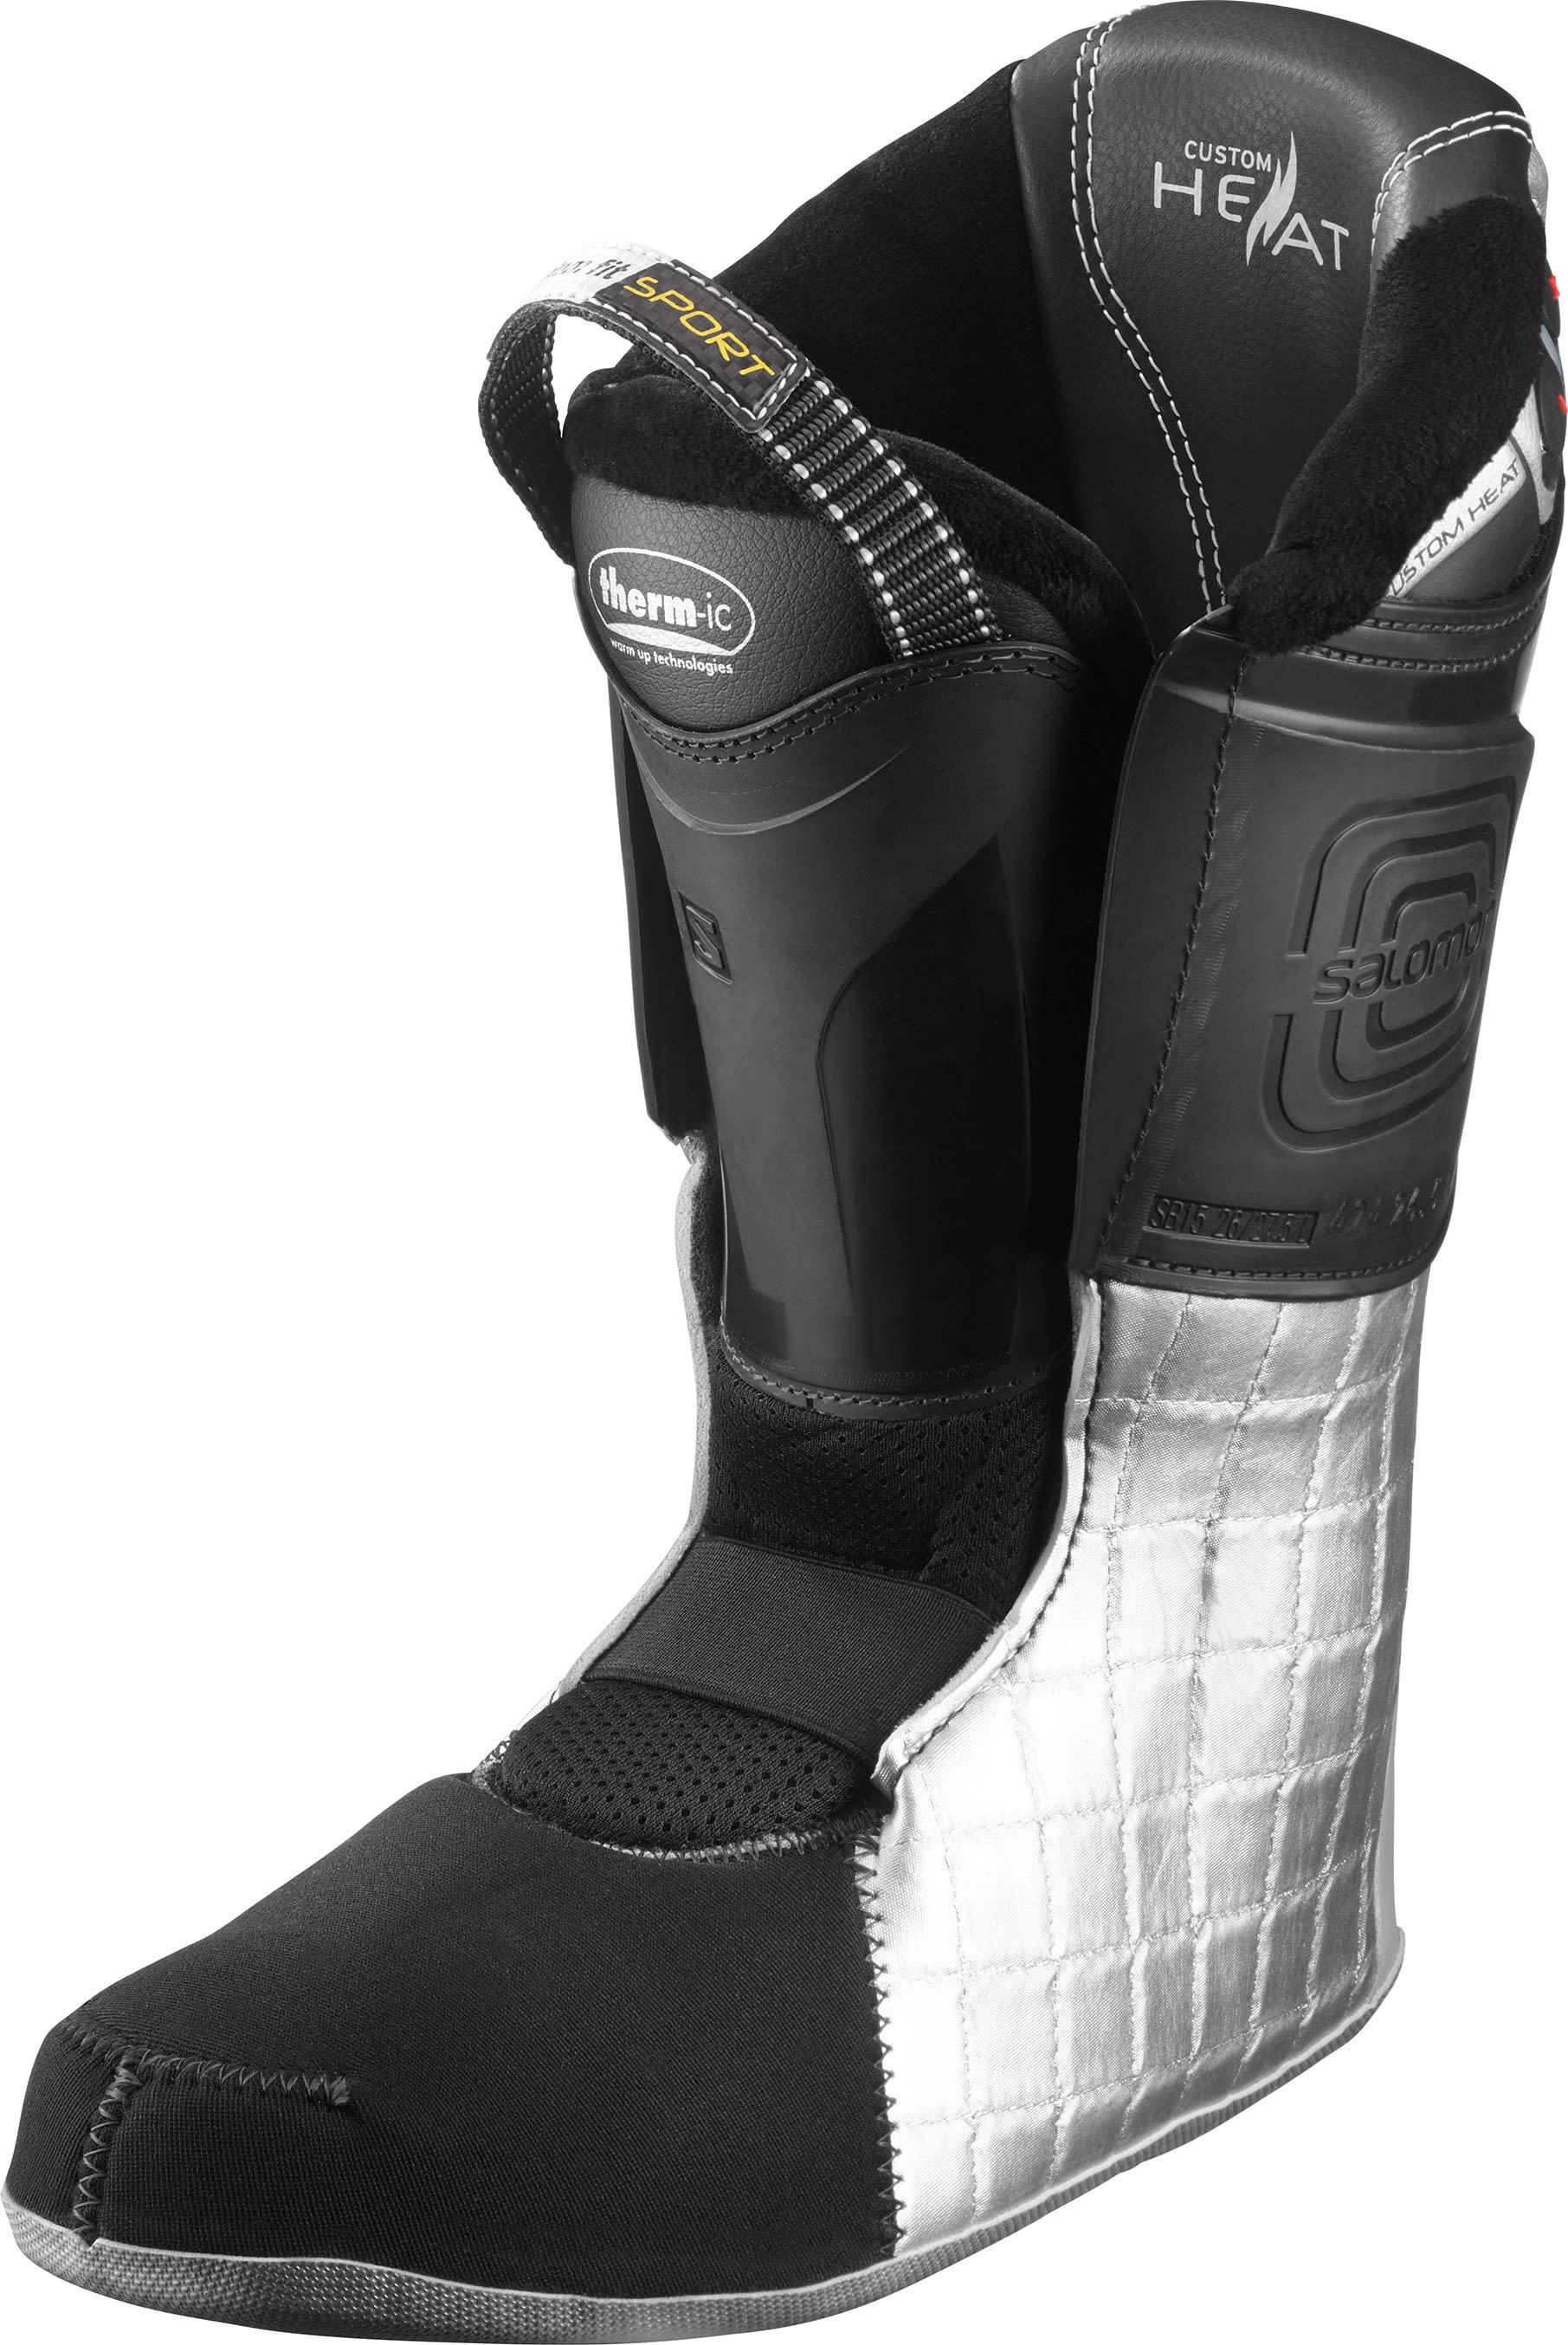 Salomon Quest Access Custom Heat Ski Boots